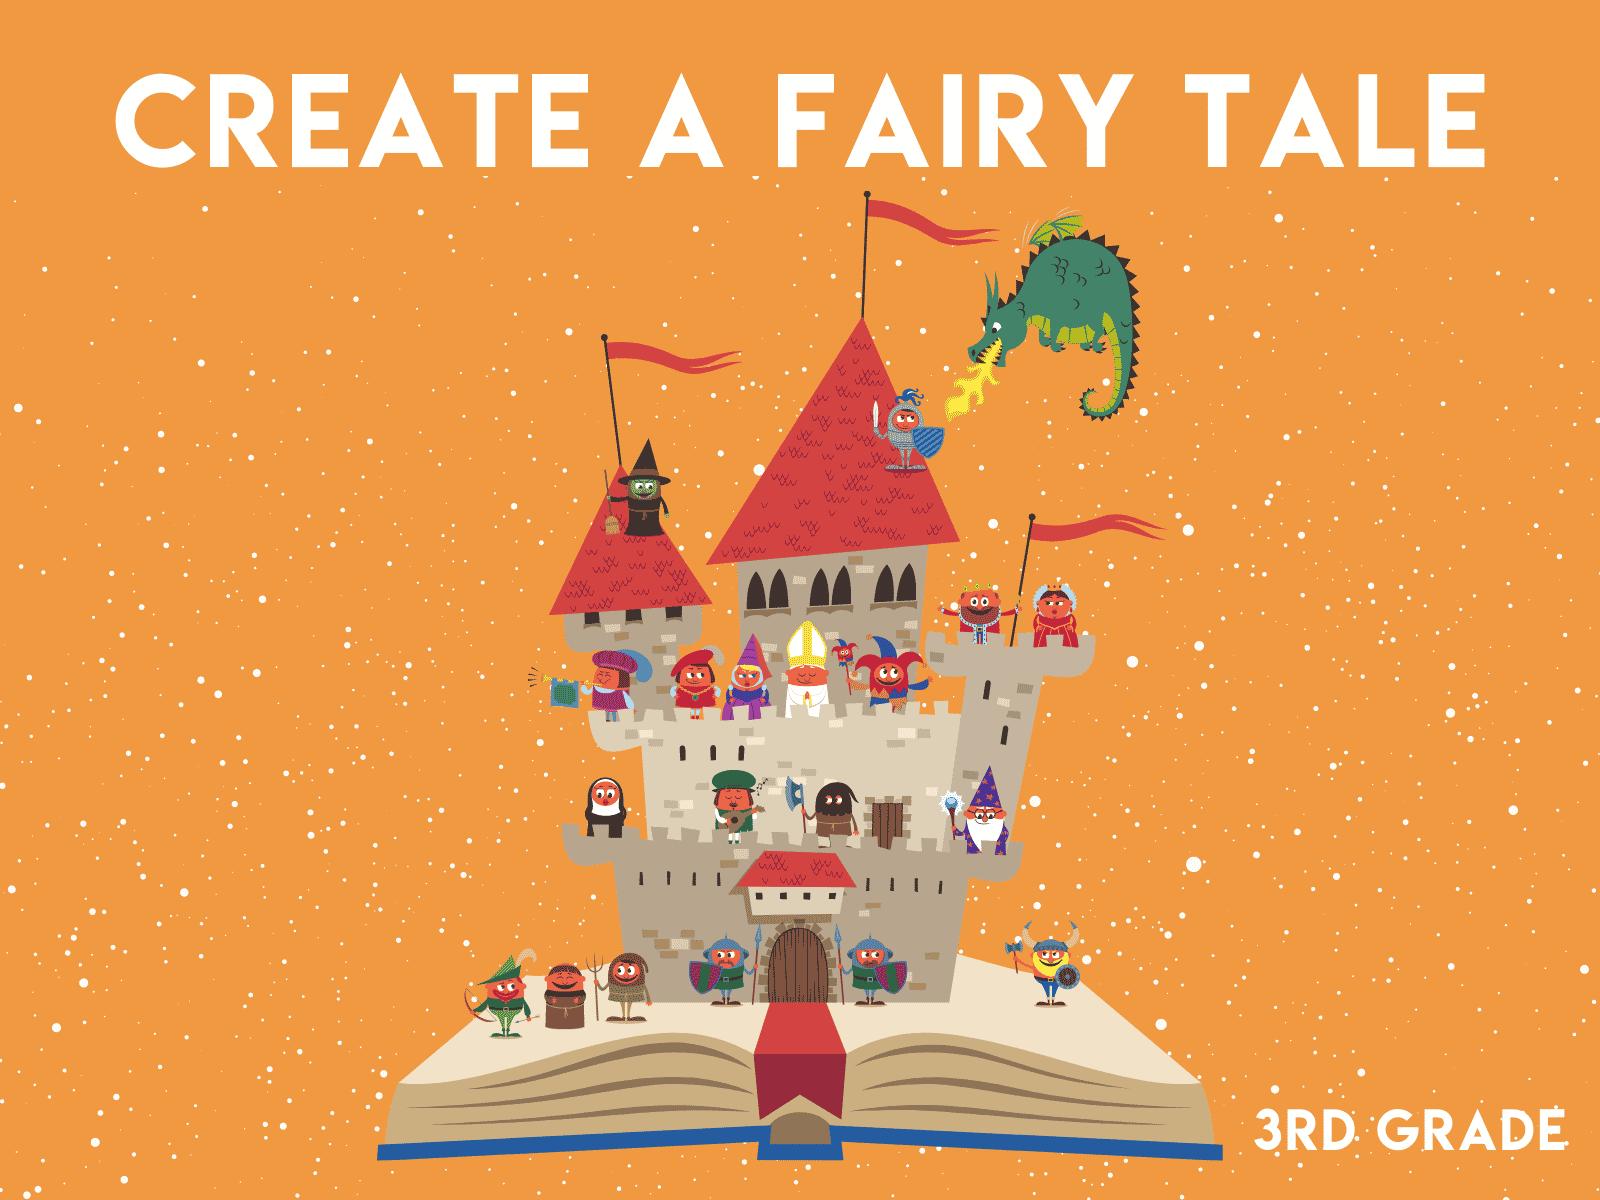 Create a Fairy Tale